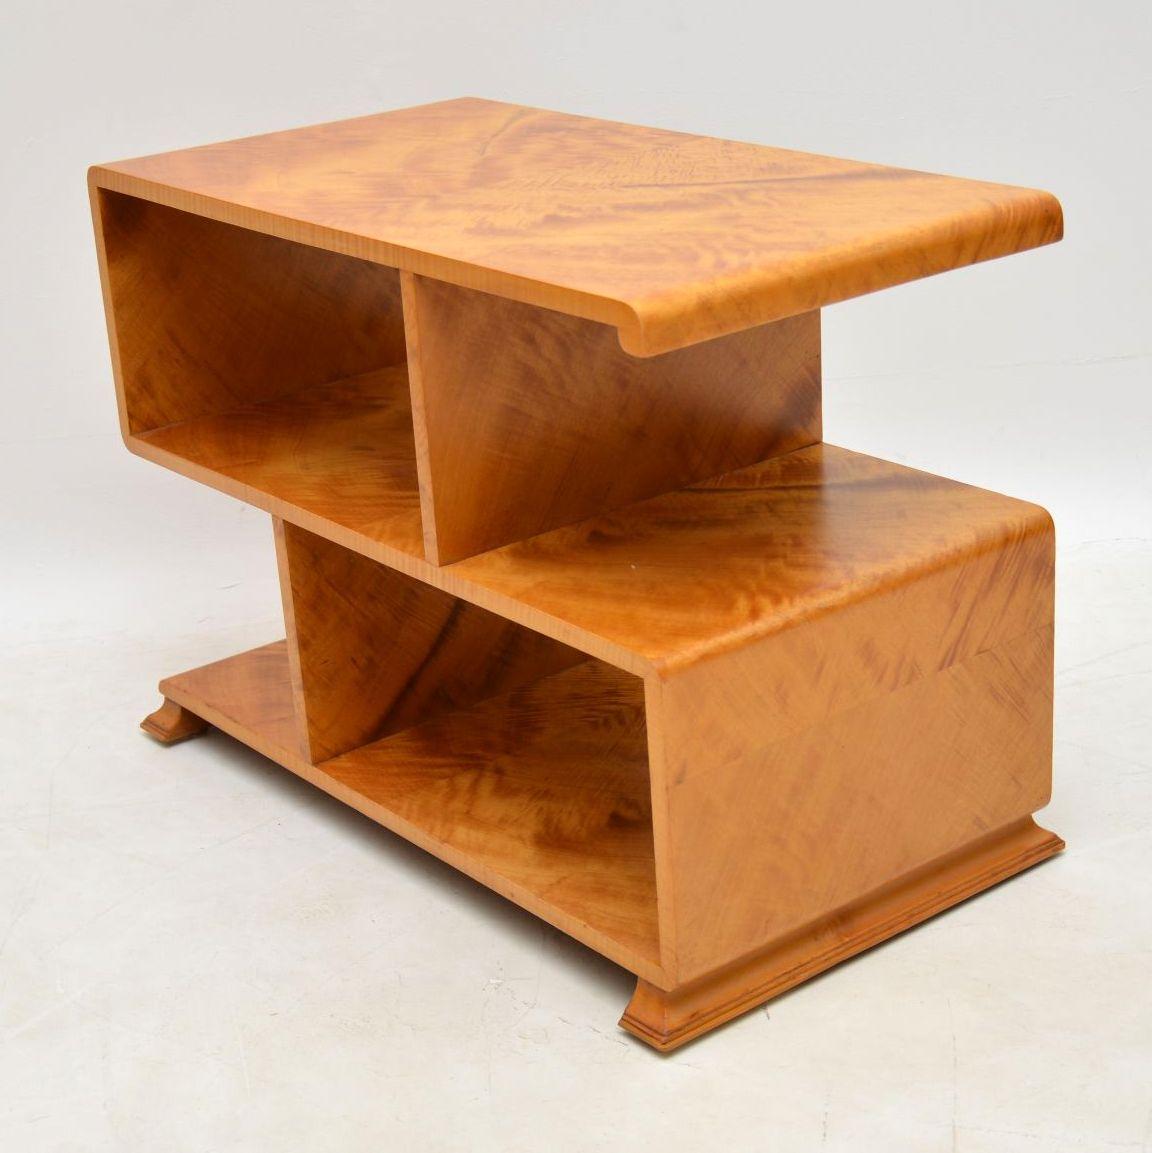 art_deco_antique_vintage_satin_wood_side_table_6